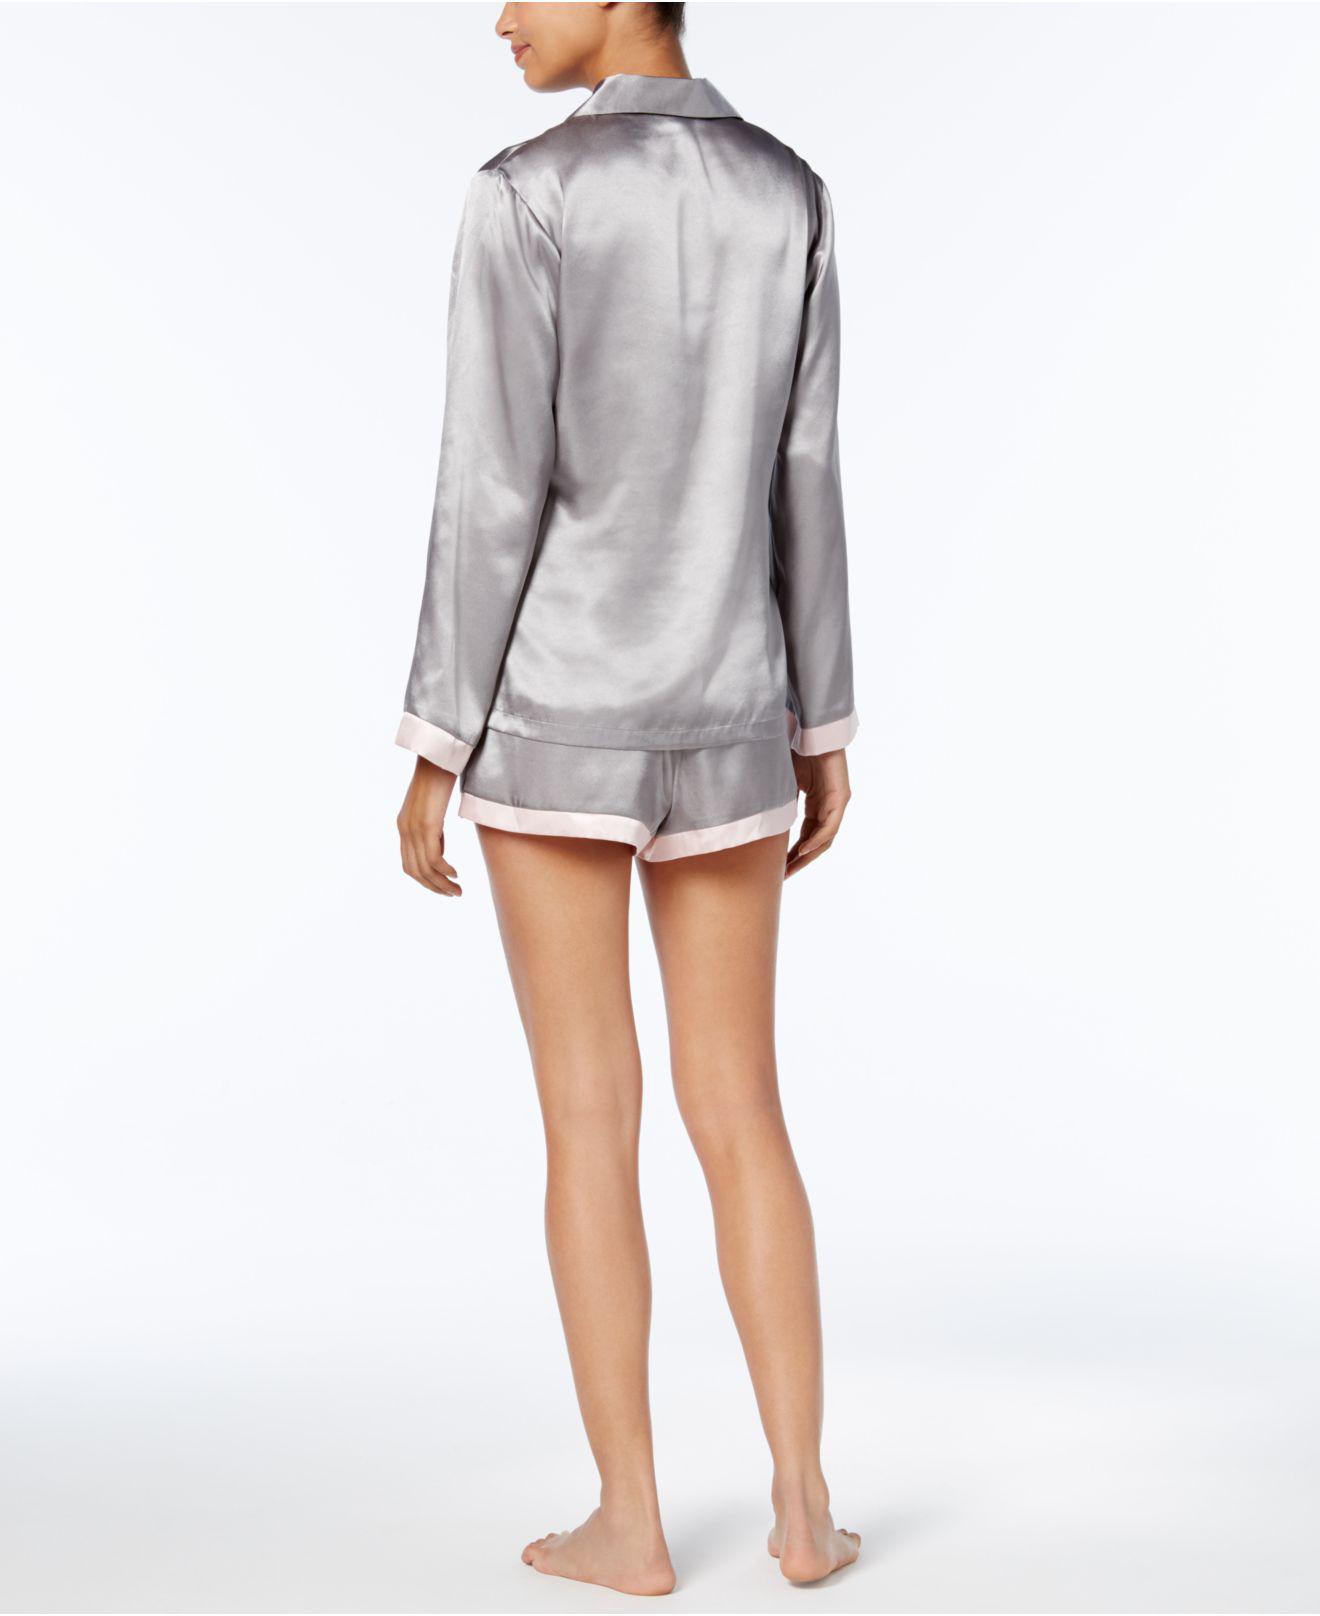 a324aa9b83 Lyst - Linea Donatella Satin Pinstripe Pajama Set in Gray